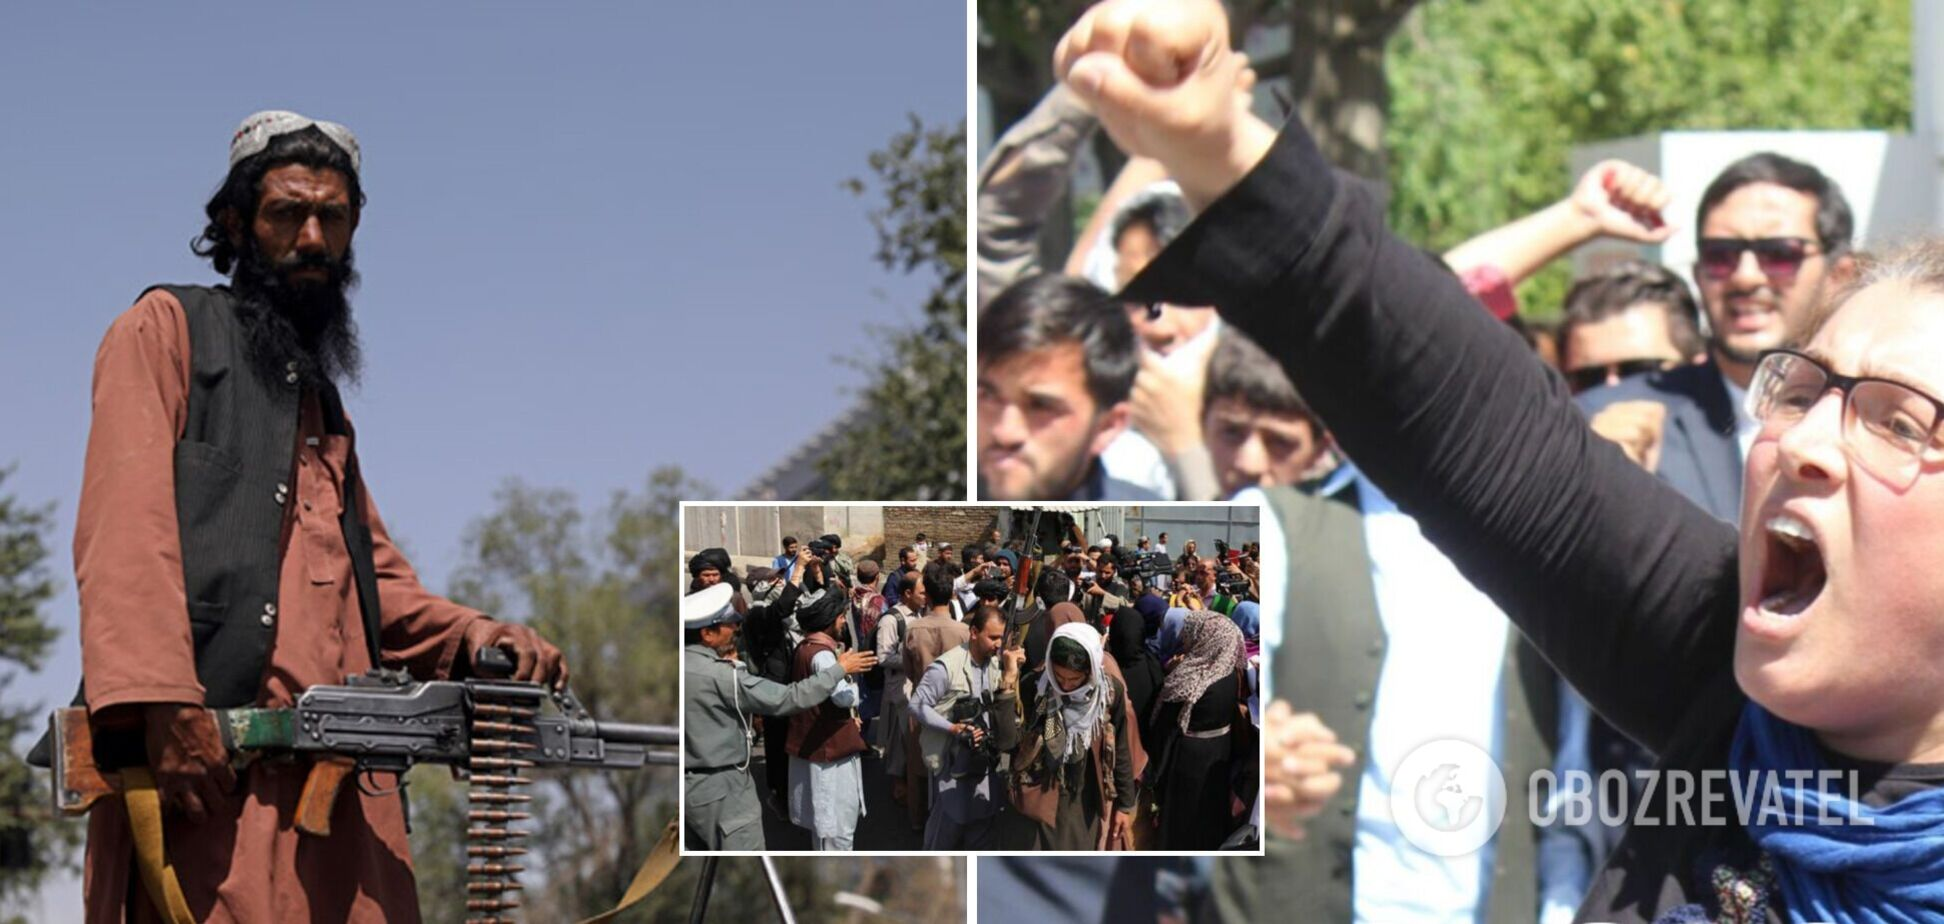 В Кабуле разогнали акцию протеста, произошла стрельба: много пострадавших. Видео